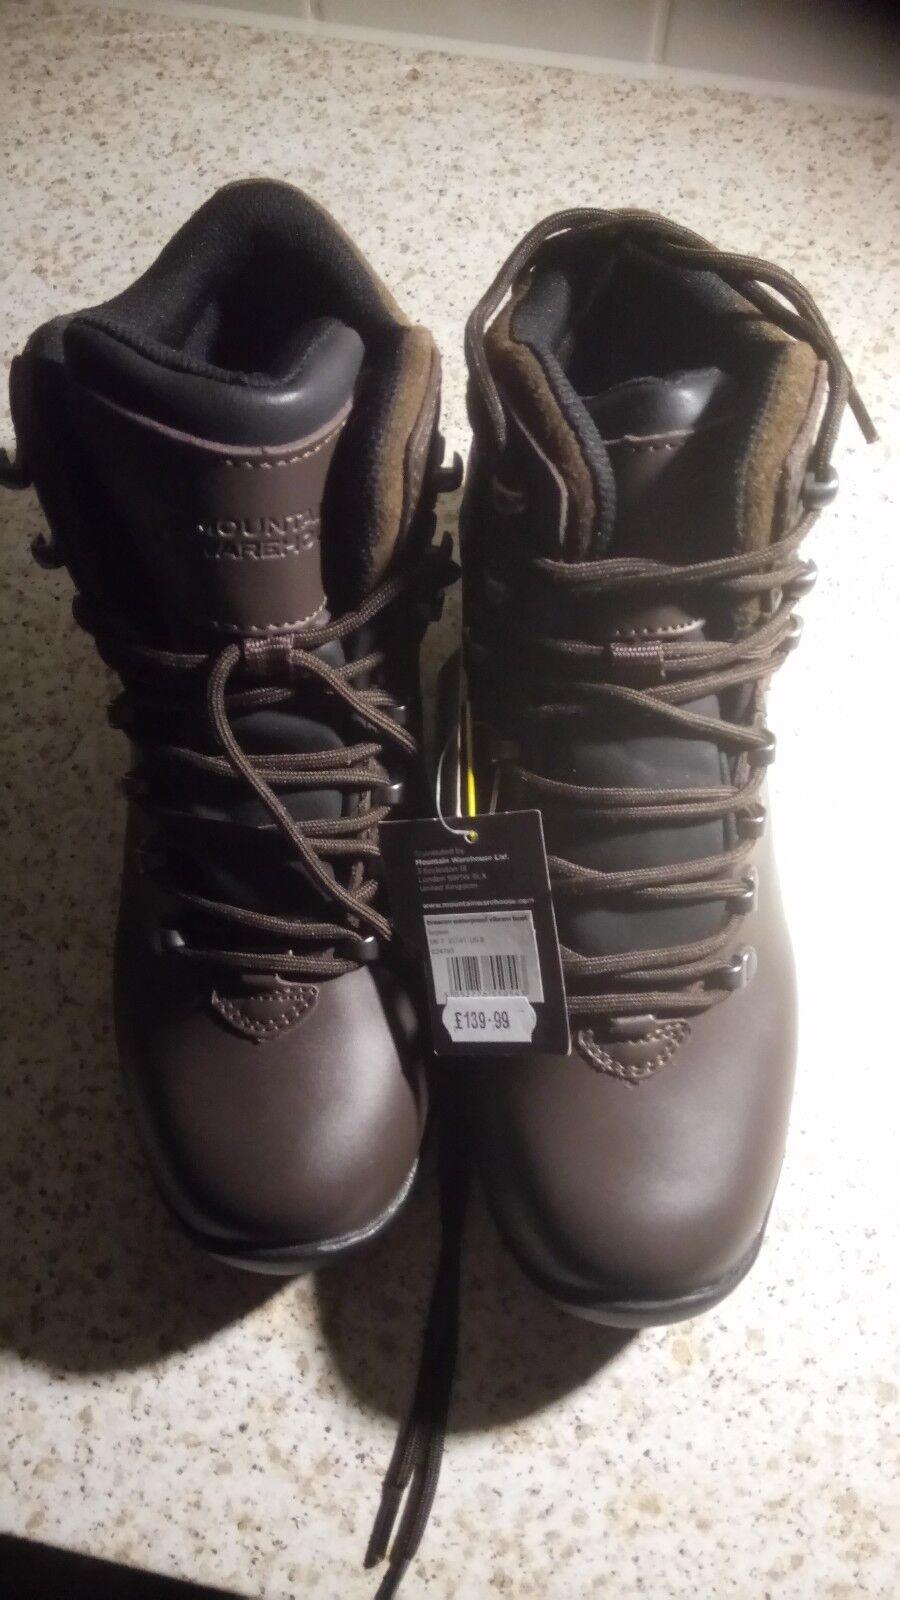 boots xs trek. Breacon (size 7) Vibram waterproof. nqcwci15207-Women ... 03e211903c1